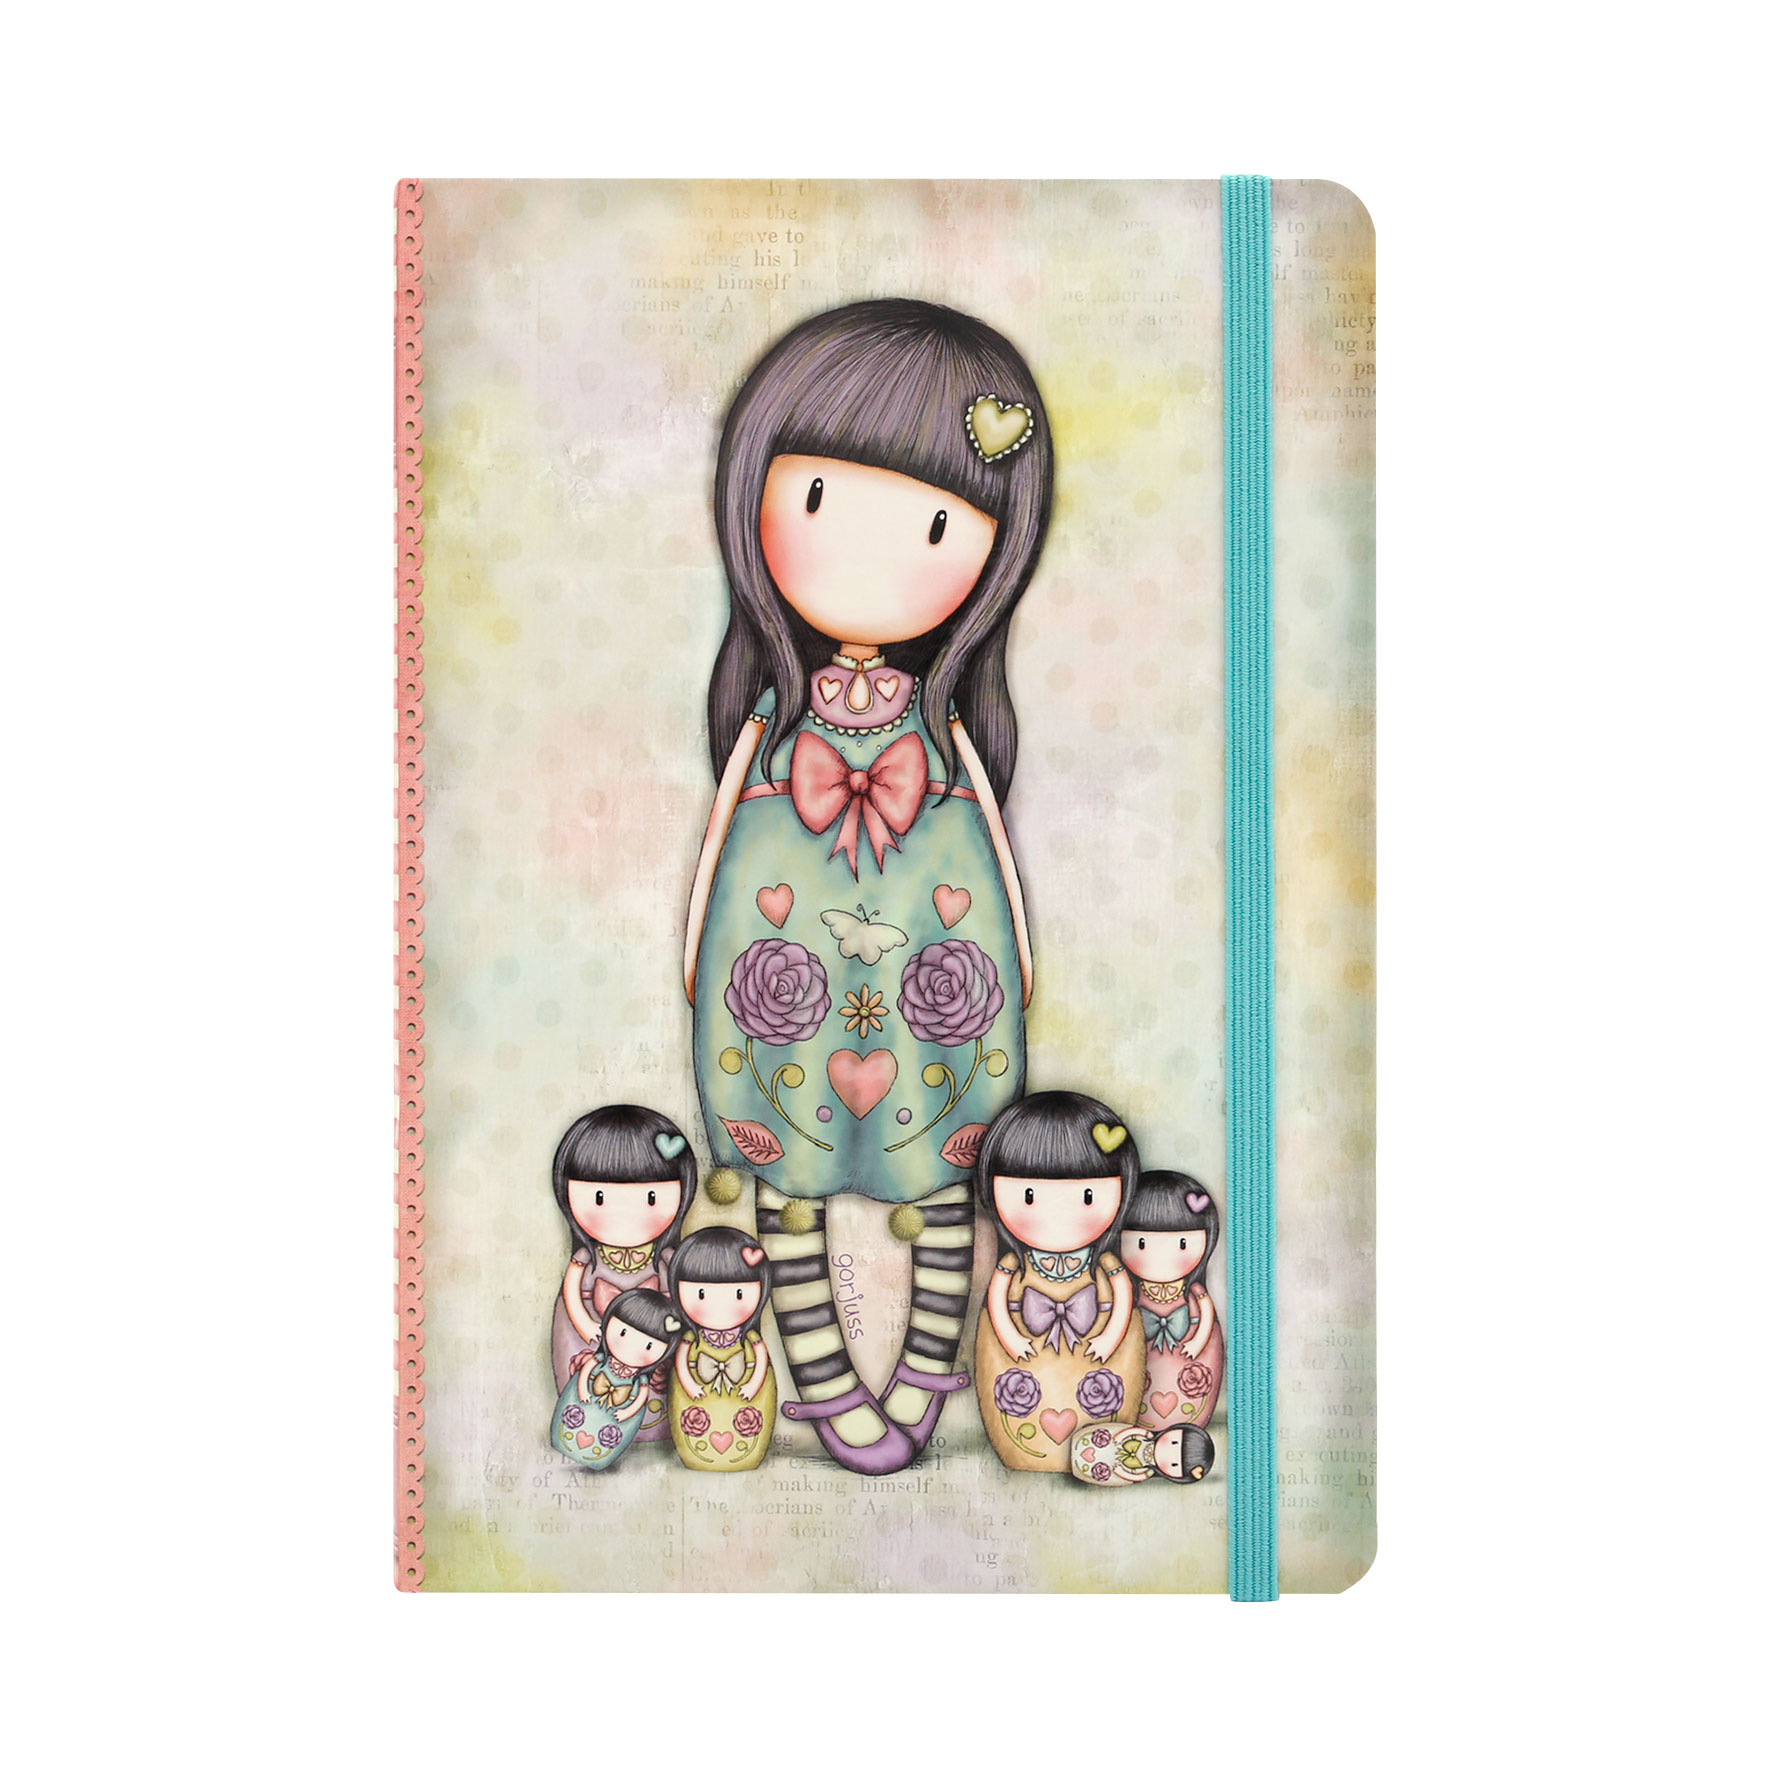 Gorjuss Hardcover Notebook - Seven Sisters